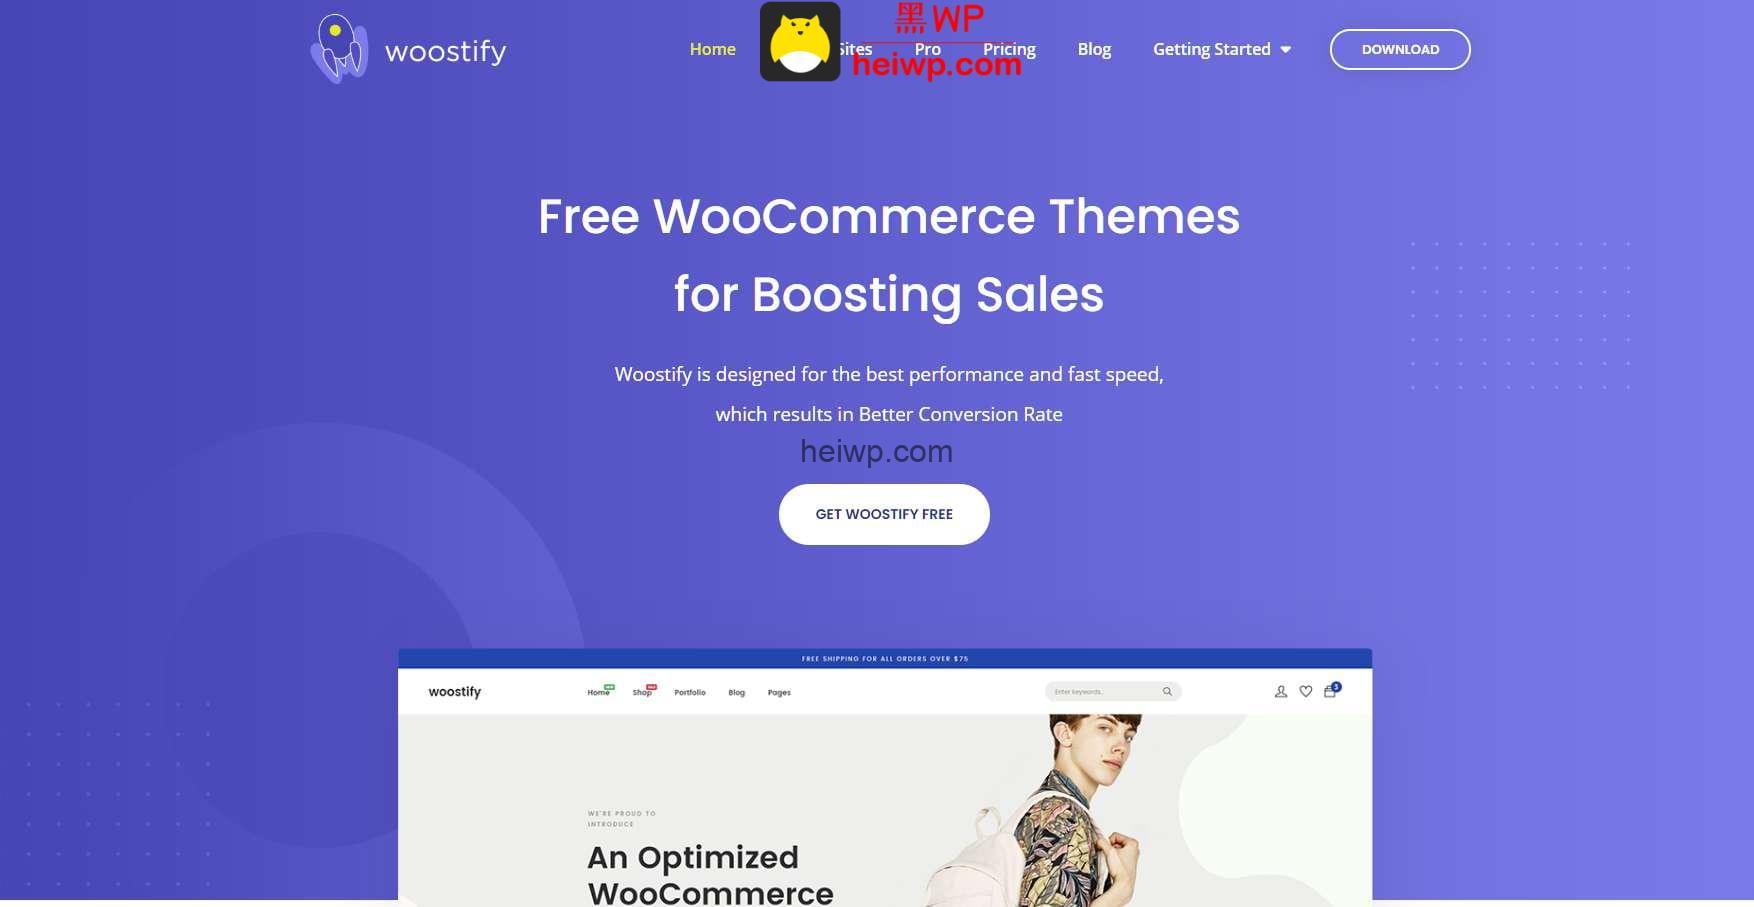 Woostify Pro--高级Wooeommerce主题【官方授权正版激活密钥Key】-黑WP